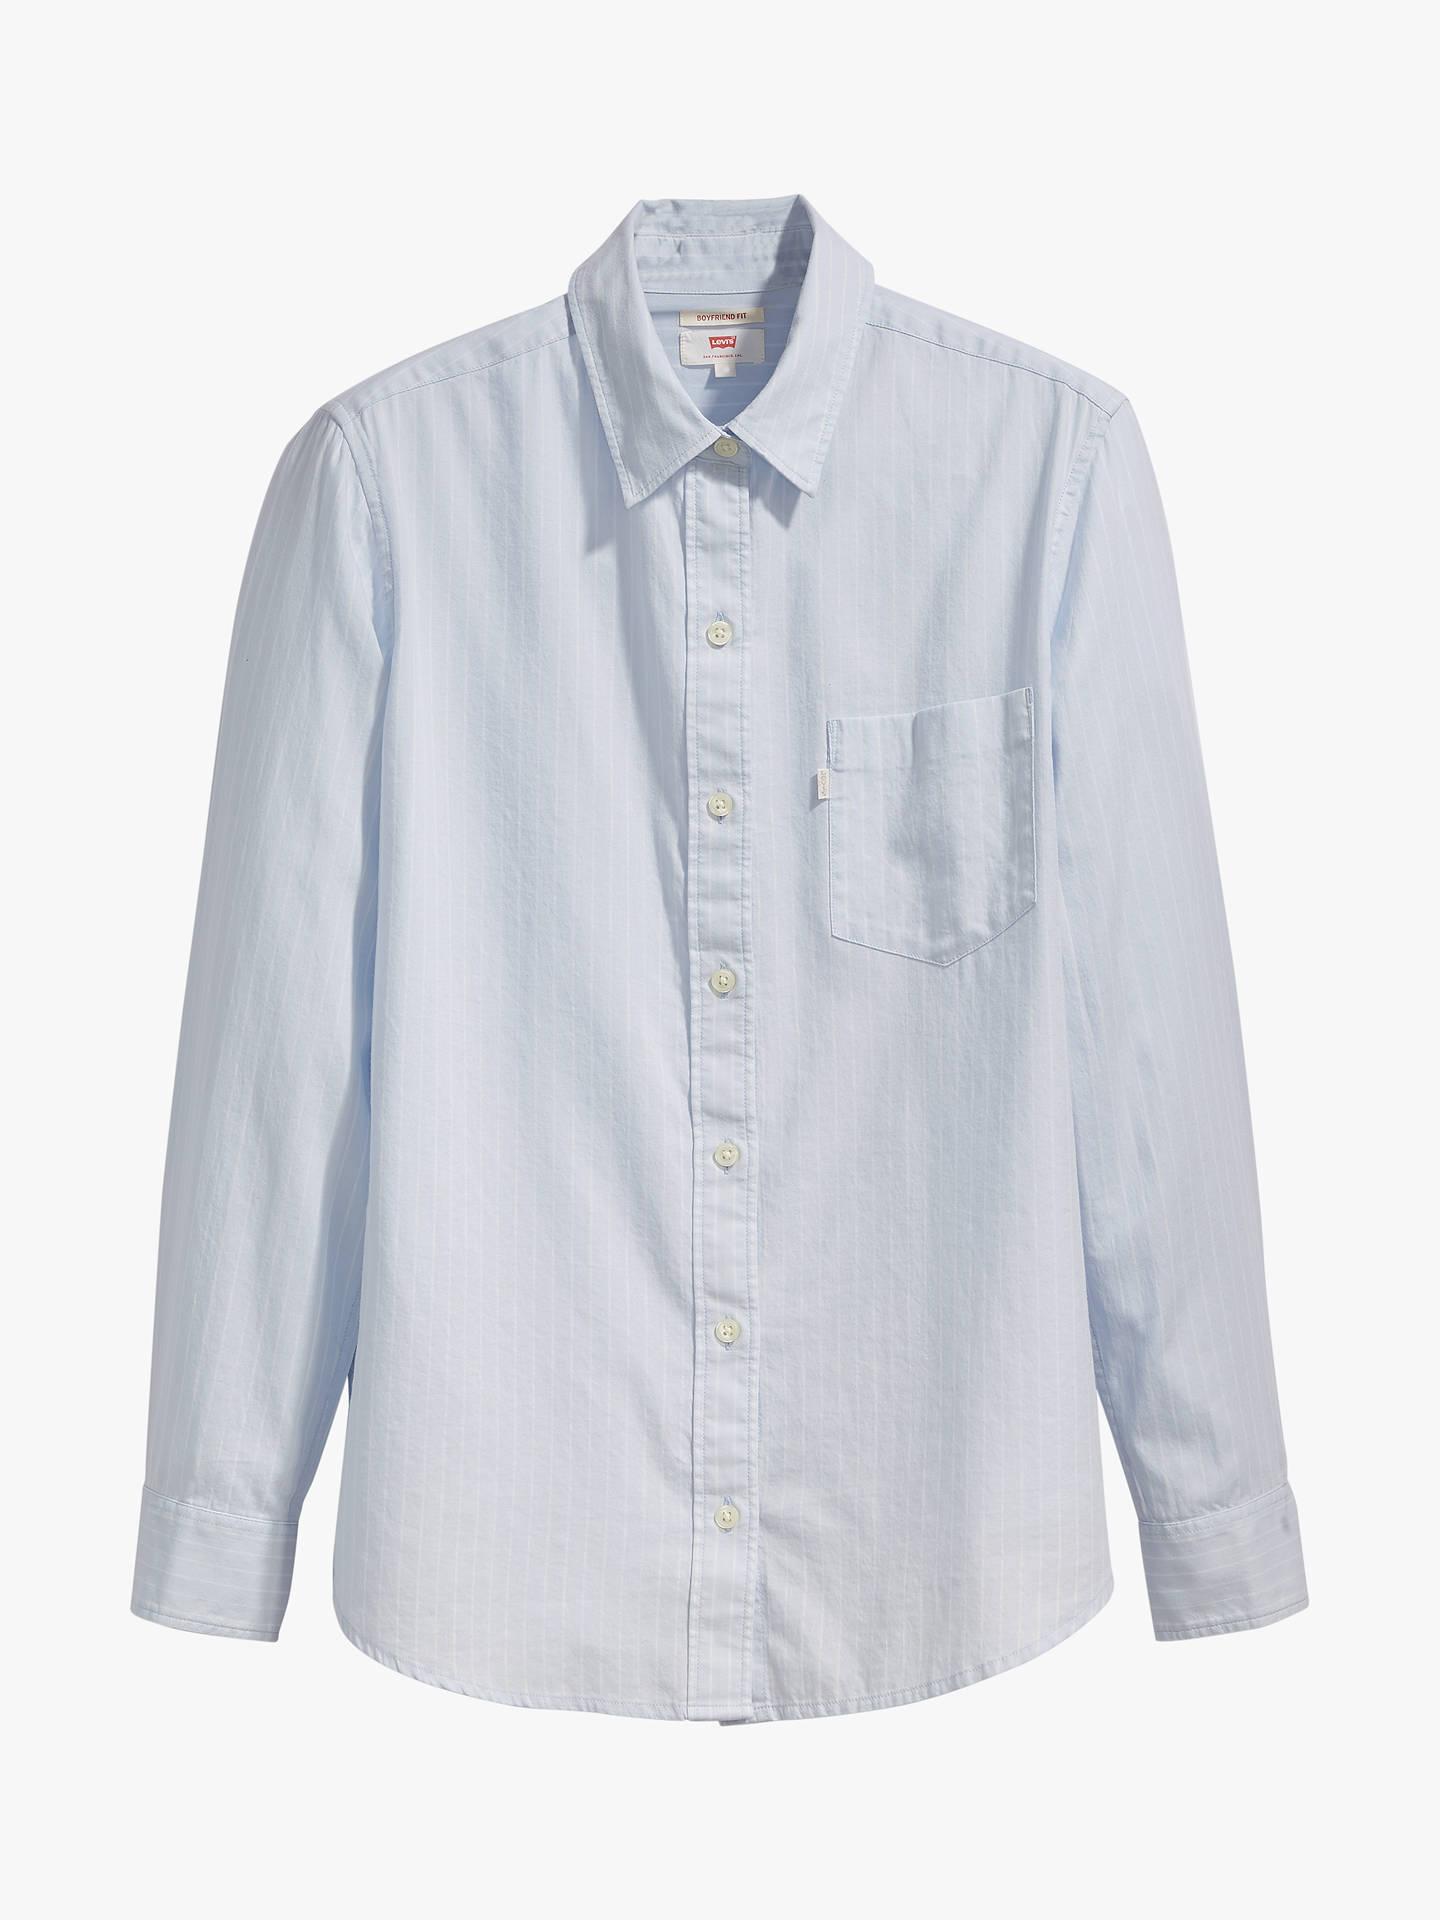 e6a59af75f8d1 Levi's Ultimate Boyfriend Stripe Cotton Shirt, Limestone Xenon Blue ...